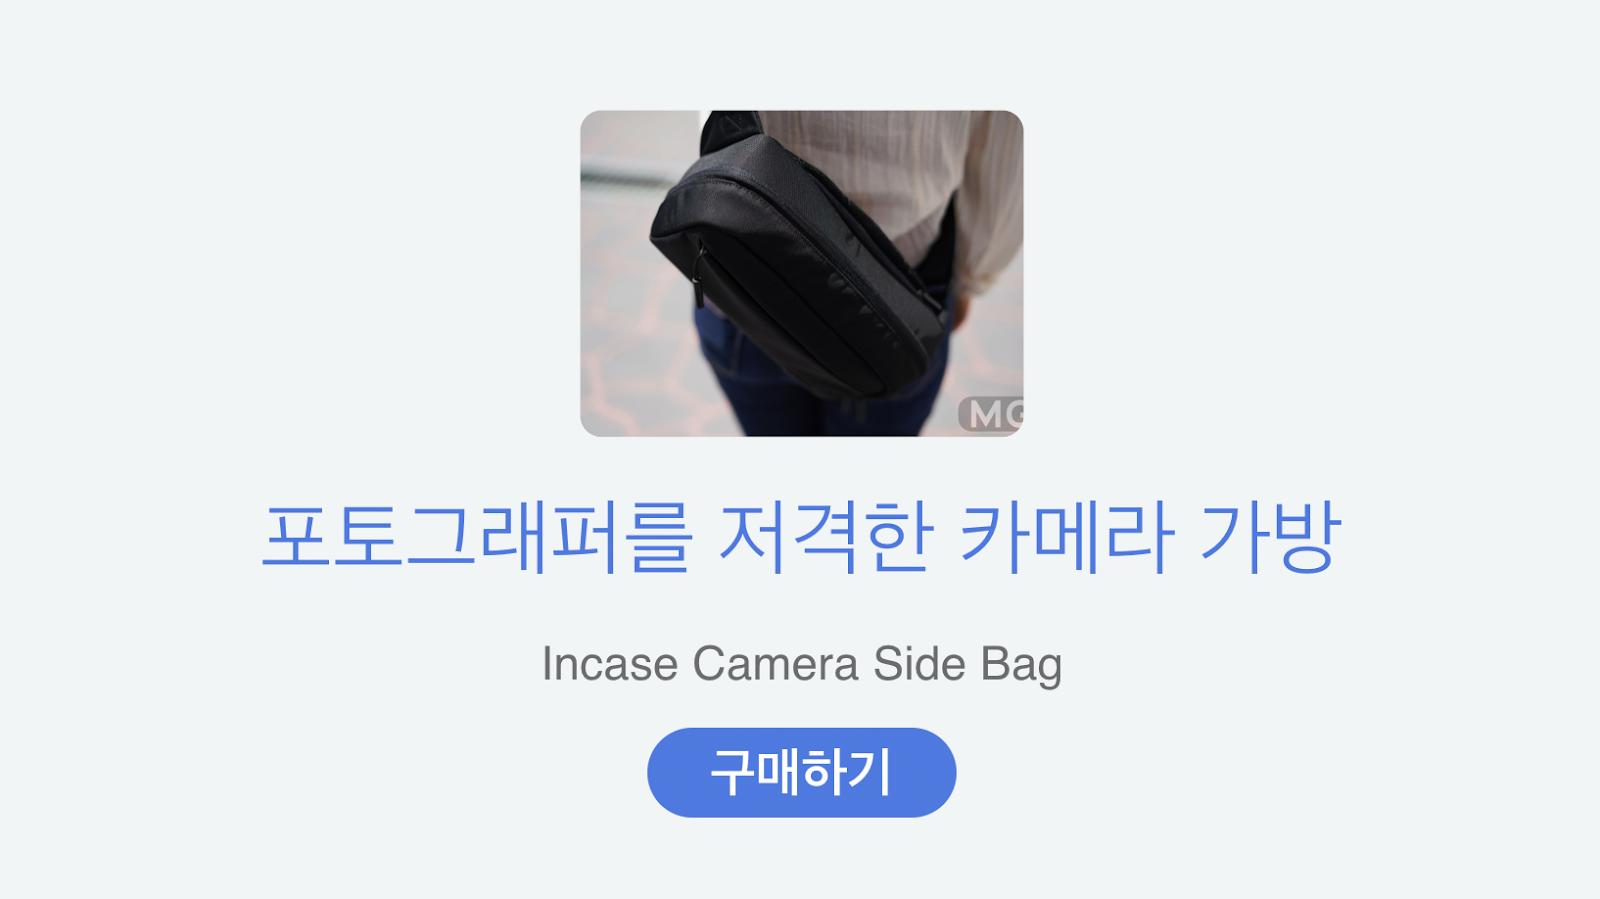 http://incase.kr/shop/shopbrand.html?type=M&xcode=001&mcode=001